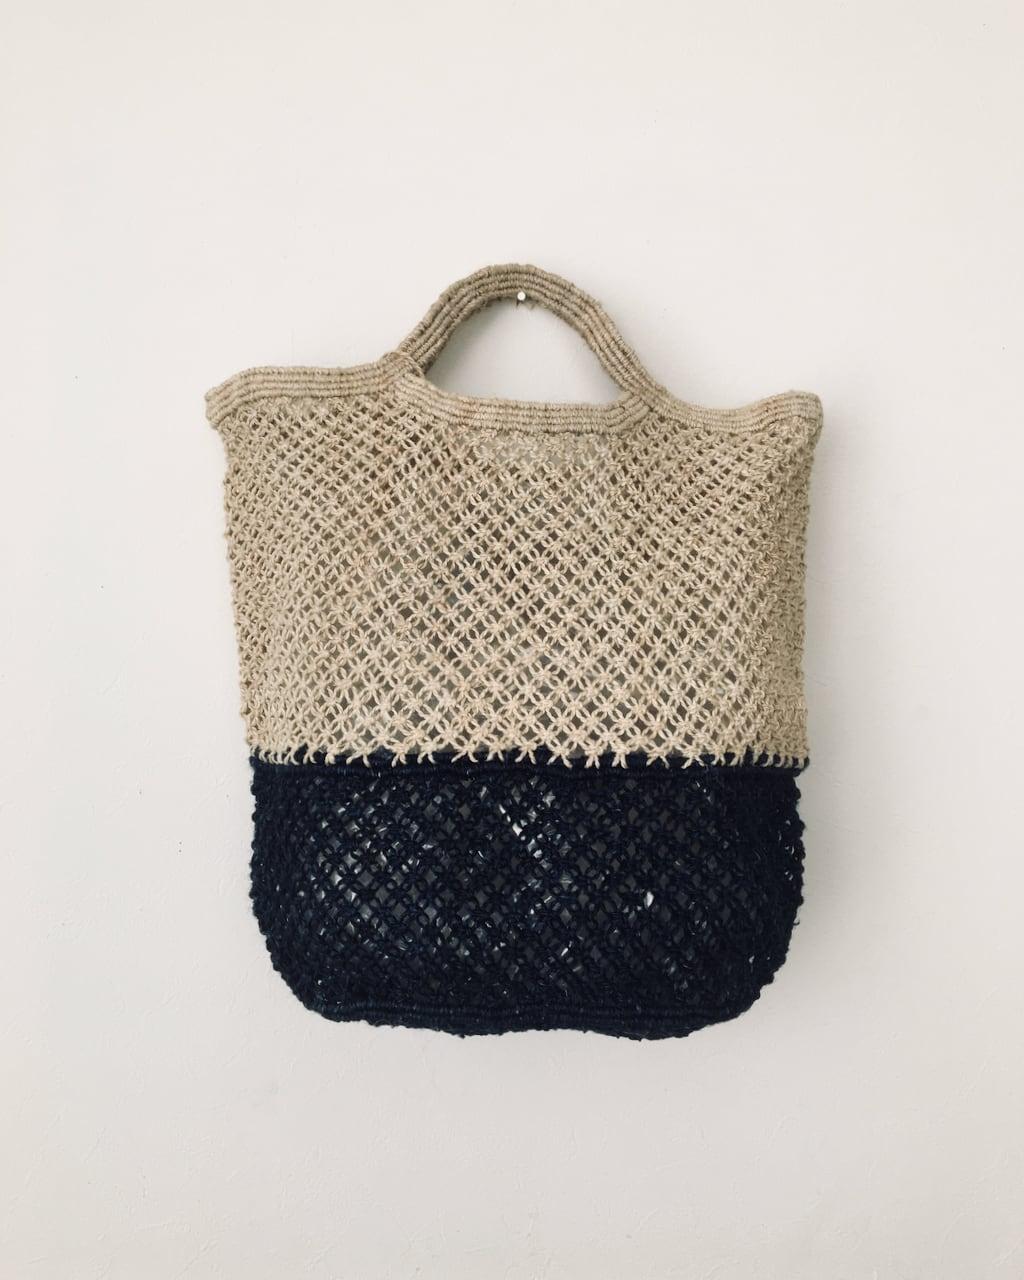 Jute macrame shopping bag Nat/Indigo ショッピングバッグ ナチュラル/インディゴ